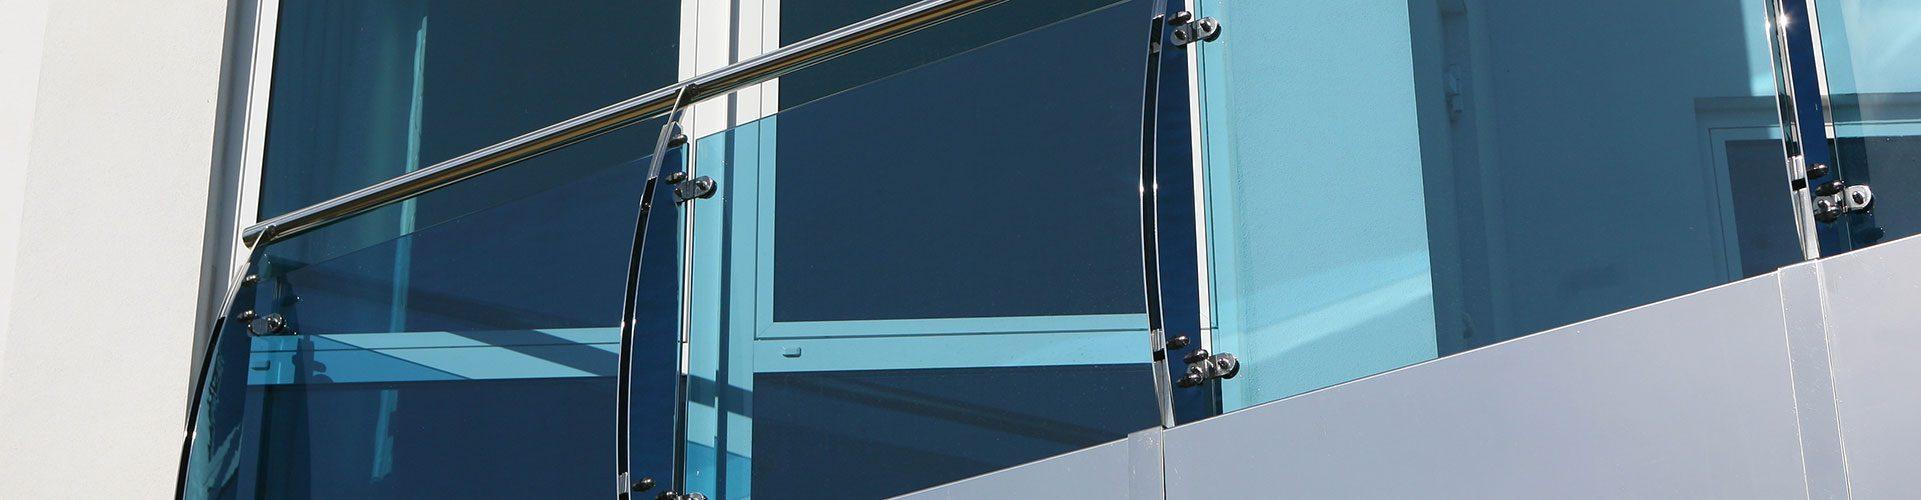 Blue glass balcony balustrade